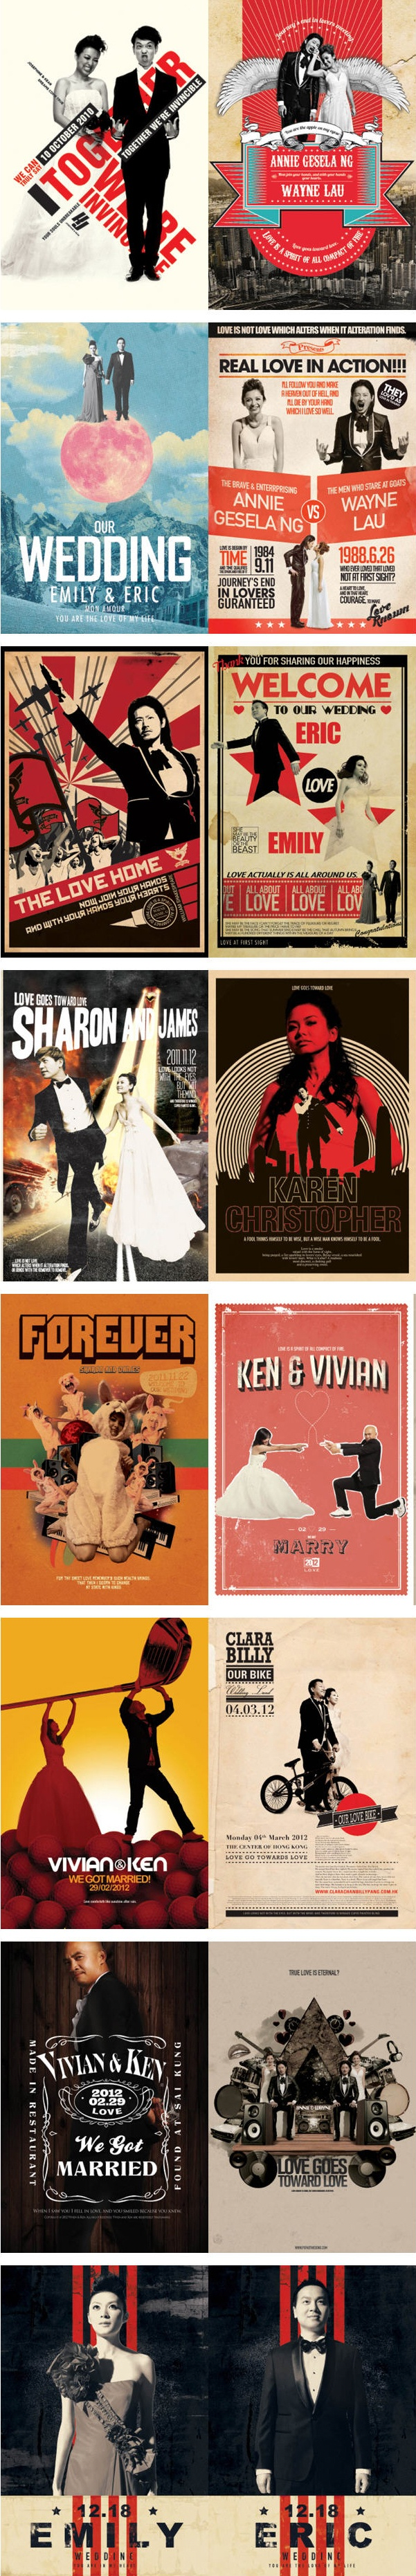 37 best Pop, mod weddings images on Pinterest | Wedding stationery ...